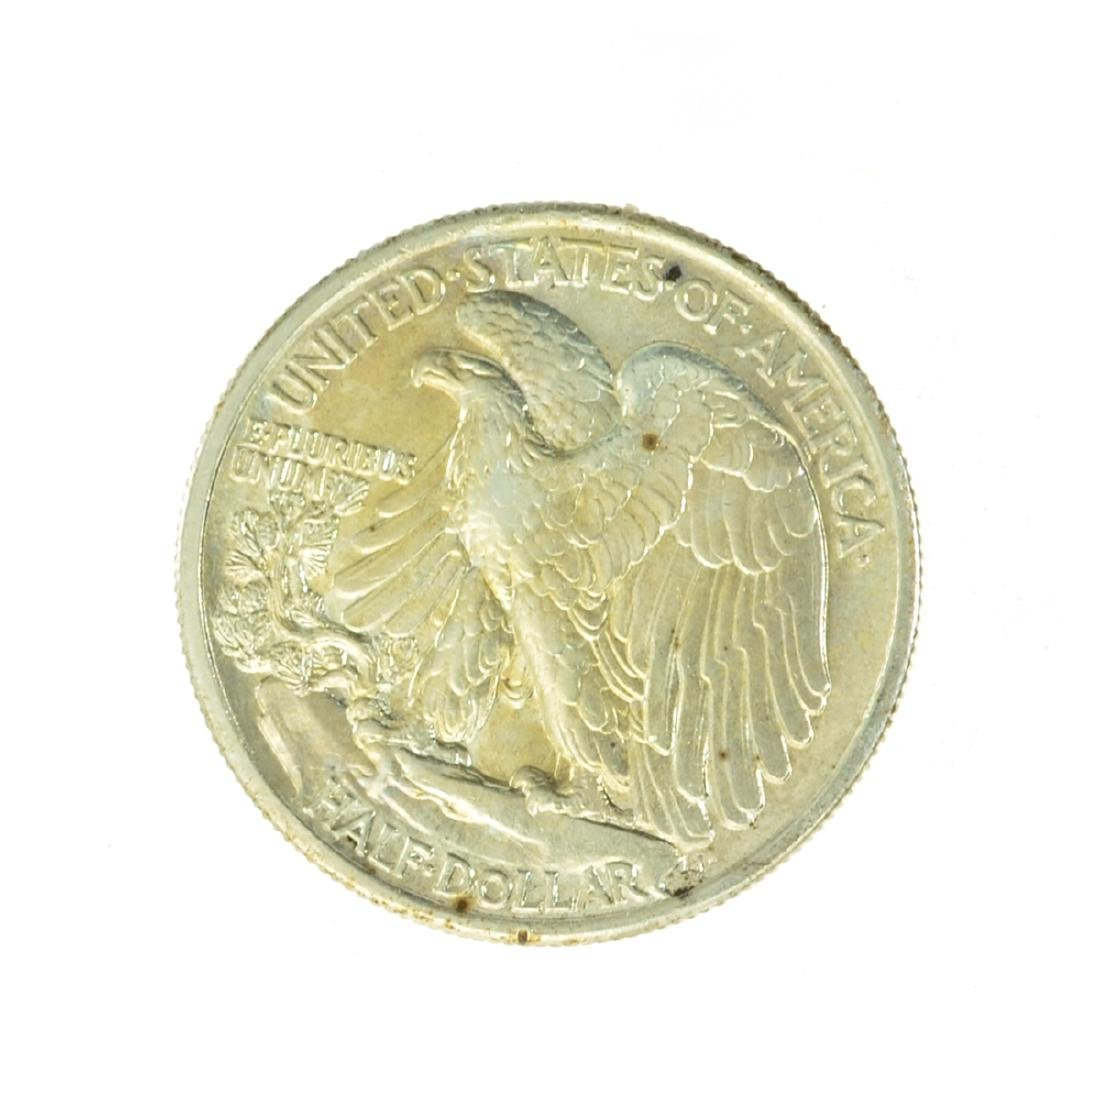 1934 Walking Liberty Half Dollar Coin - 2